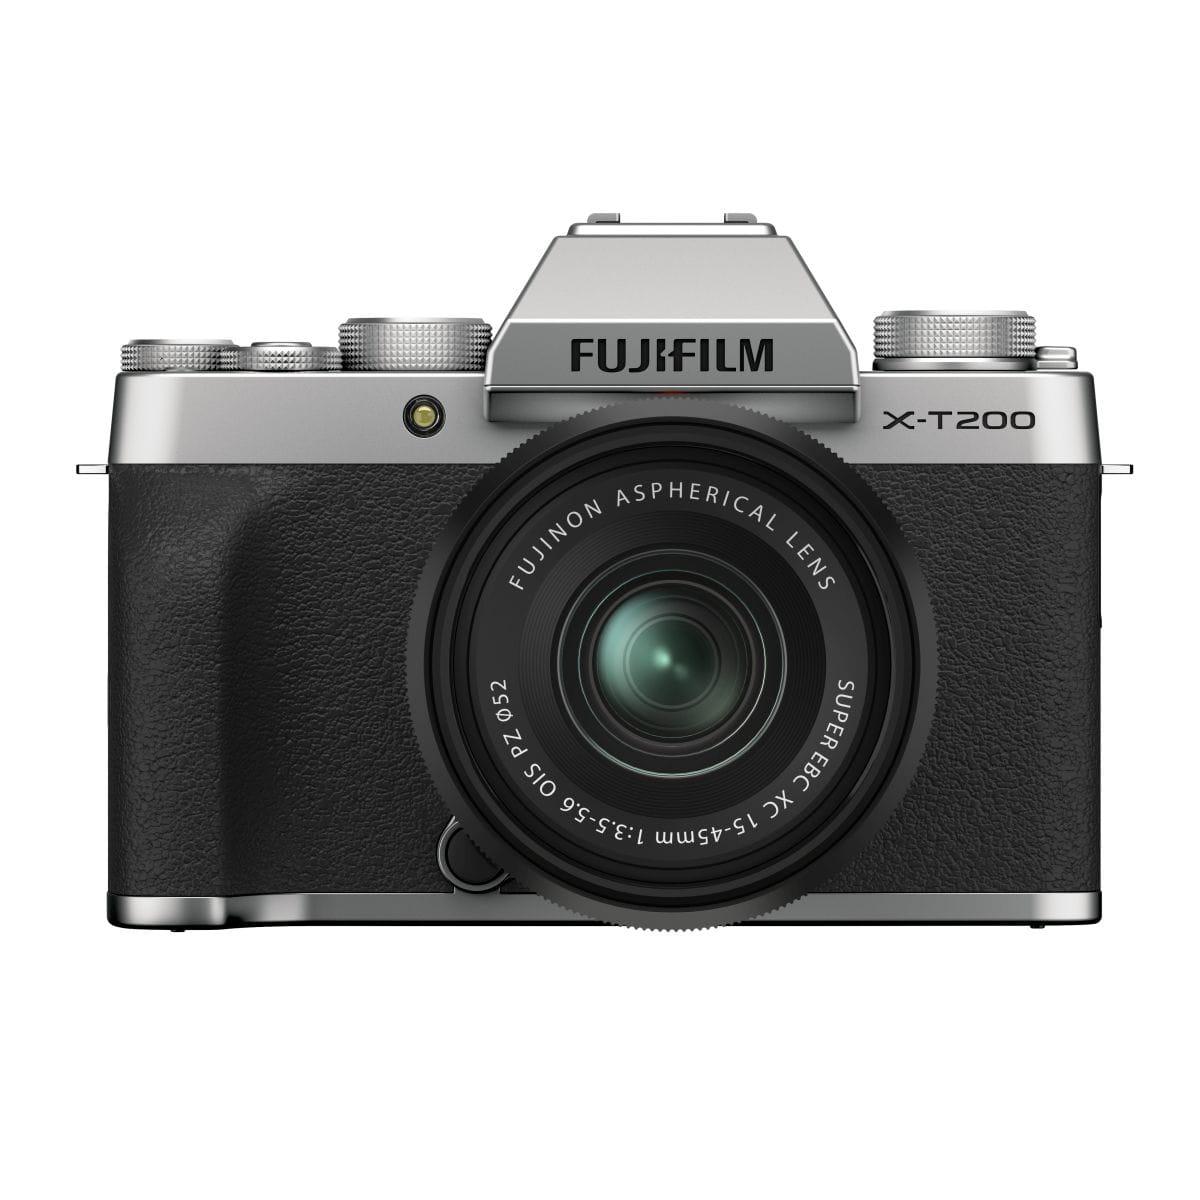 Aparat Fujifilm X-T200 srebrny + obiektyw 15-45MM